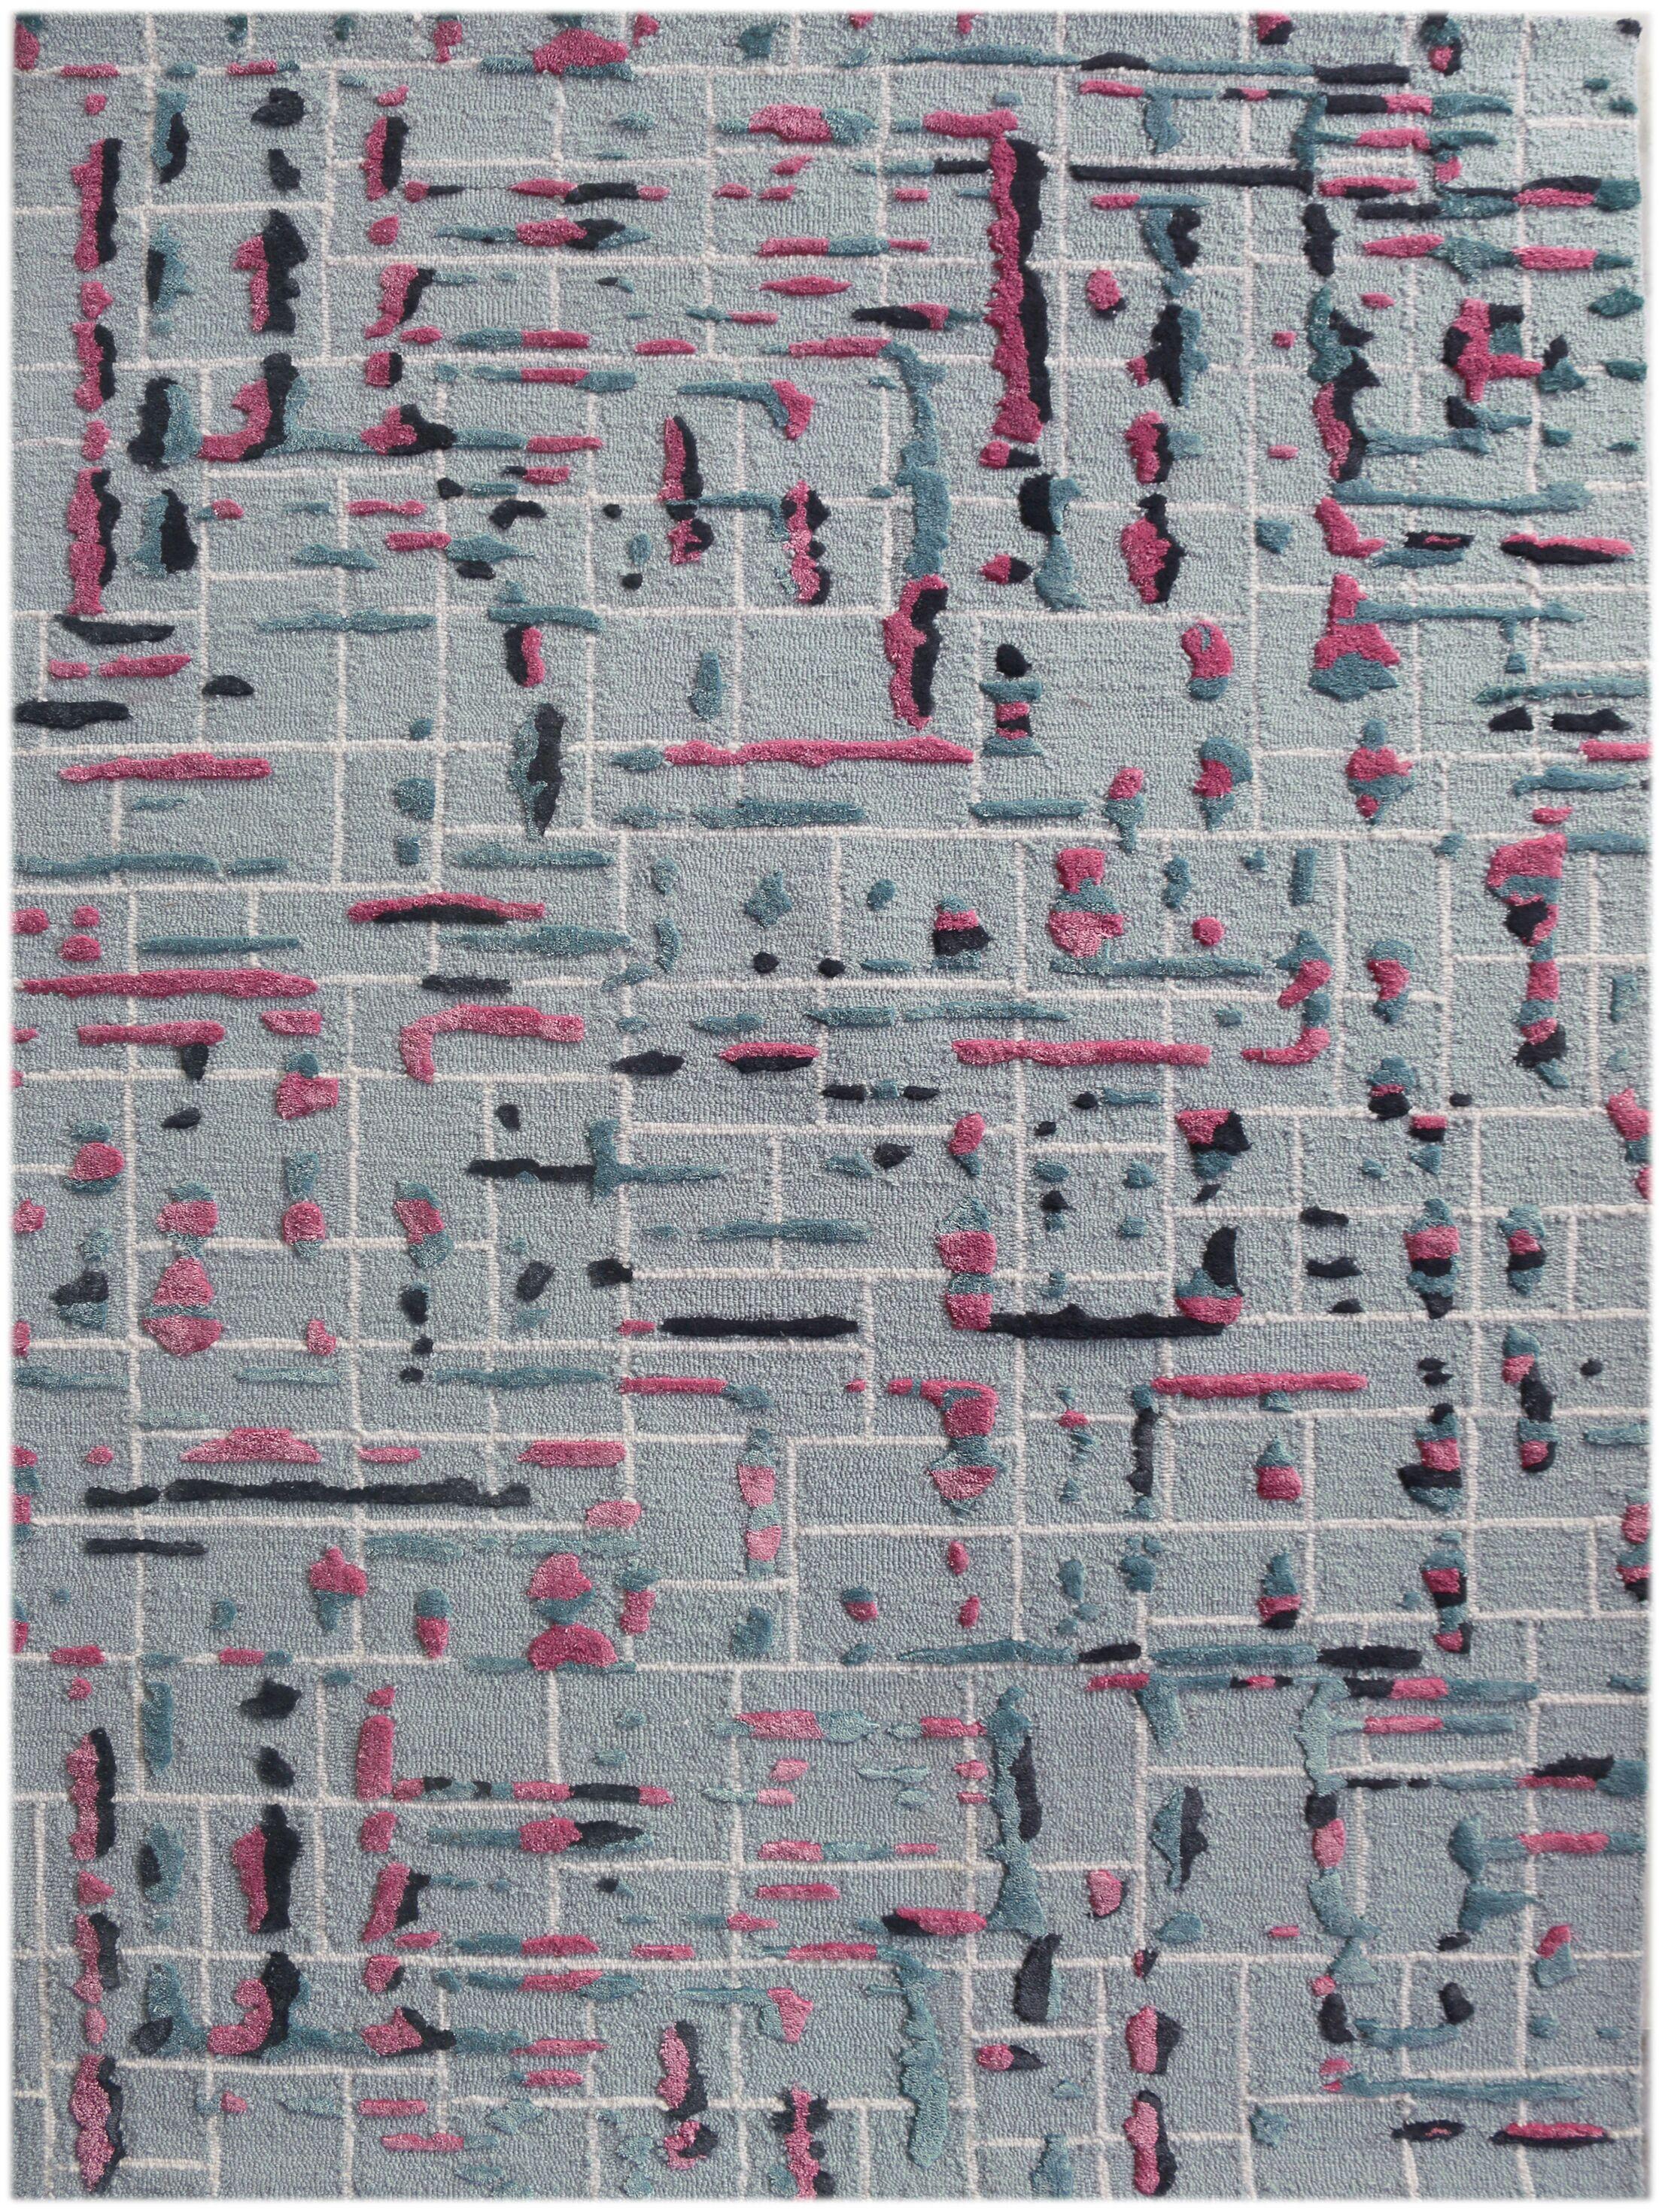 Faraci Hand-Tufted Pink Area Rug Rug Size: Rectangle 5' x 7'6